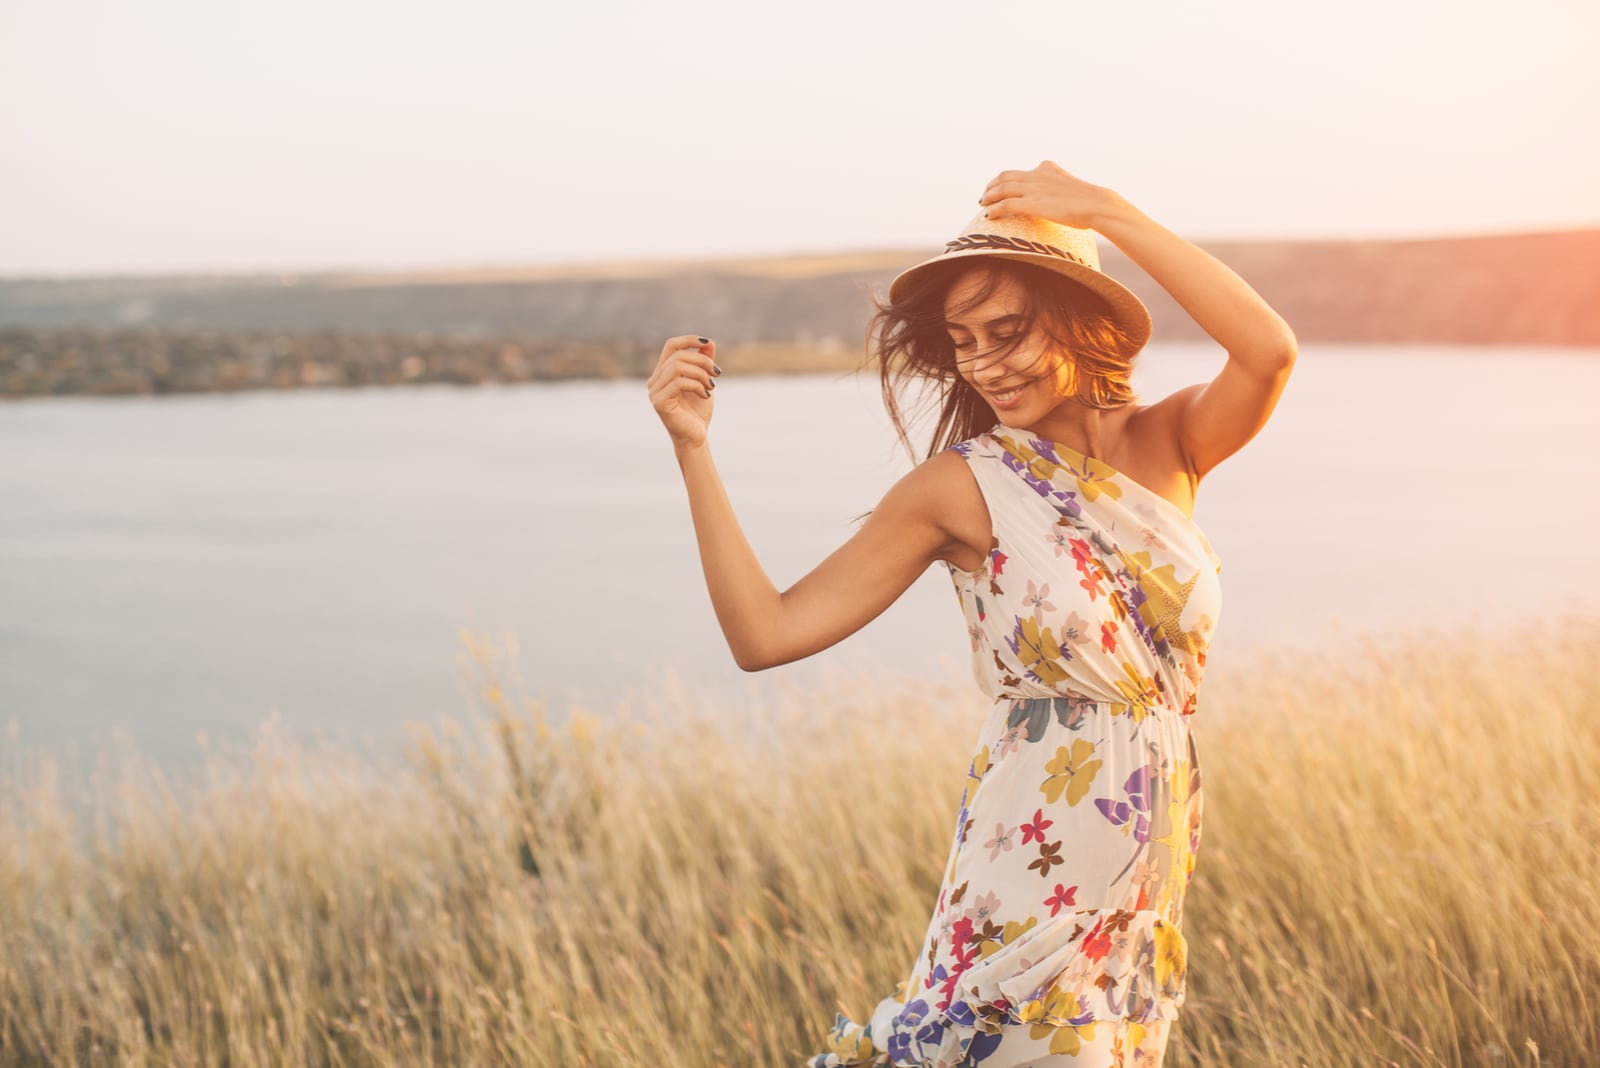 young girl outdoors enjoying nature